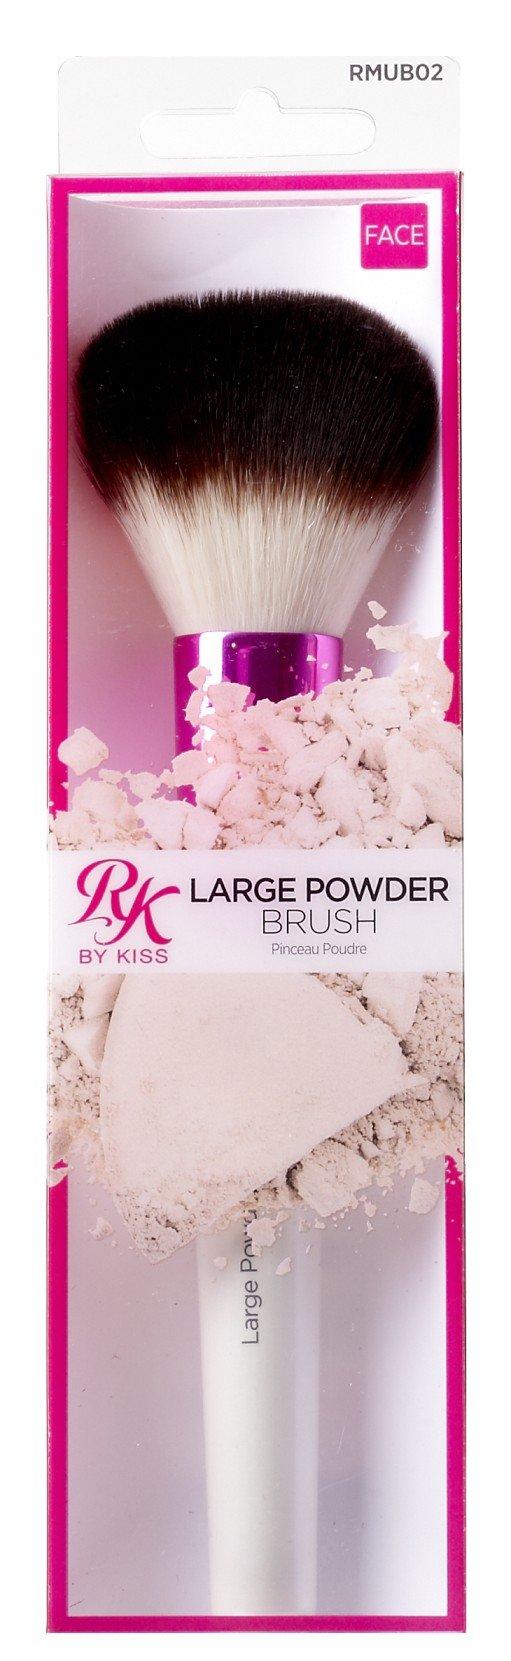 Kiss Ruby Kisses Make-Up Brush Powder Large (6 Pack)